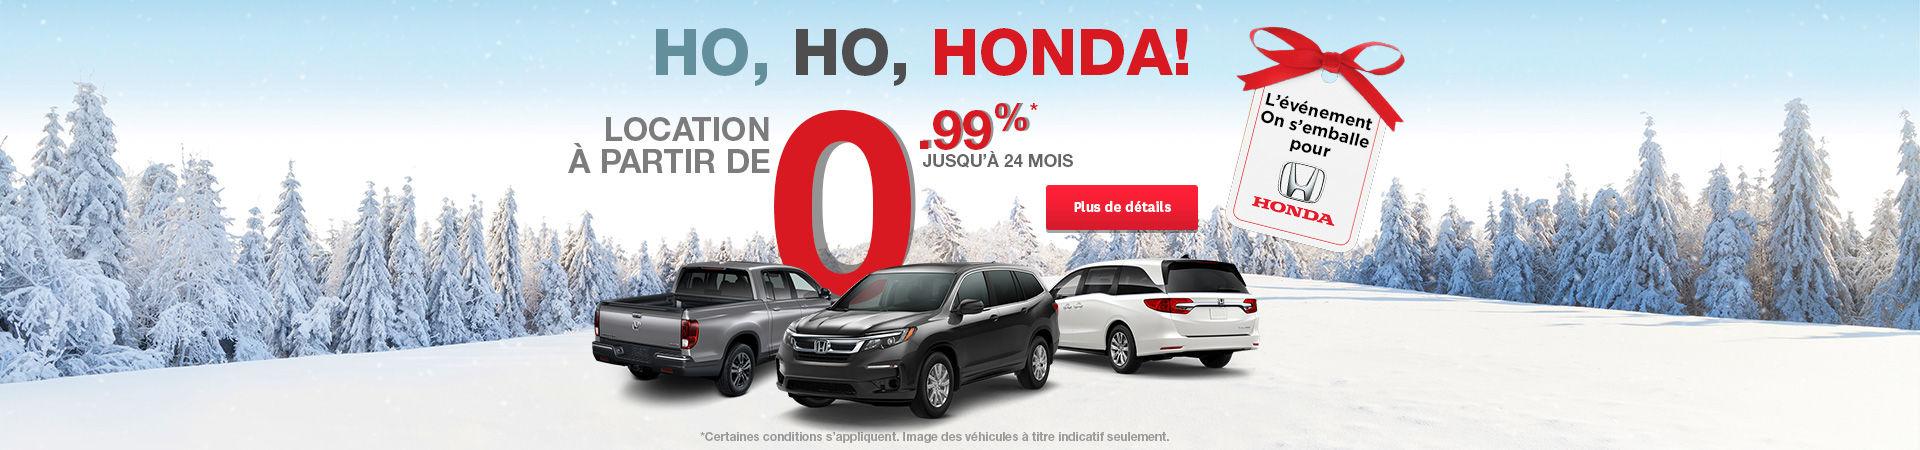 Evénement Honda - Header